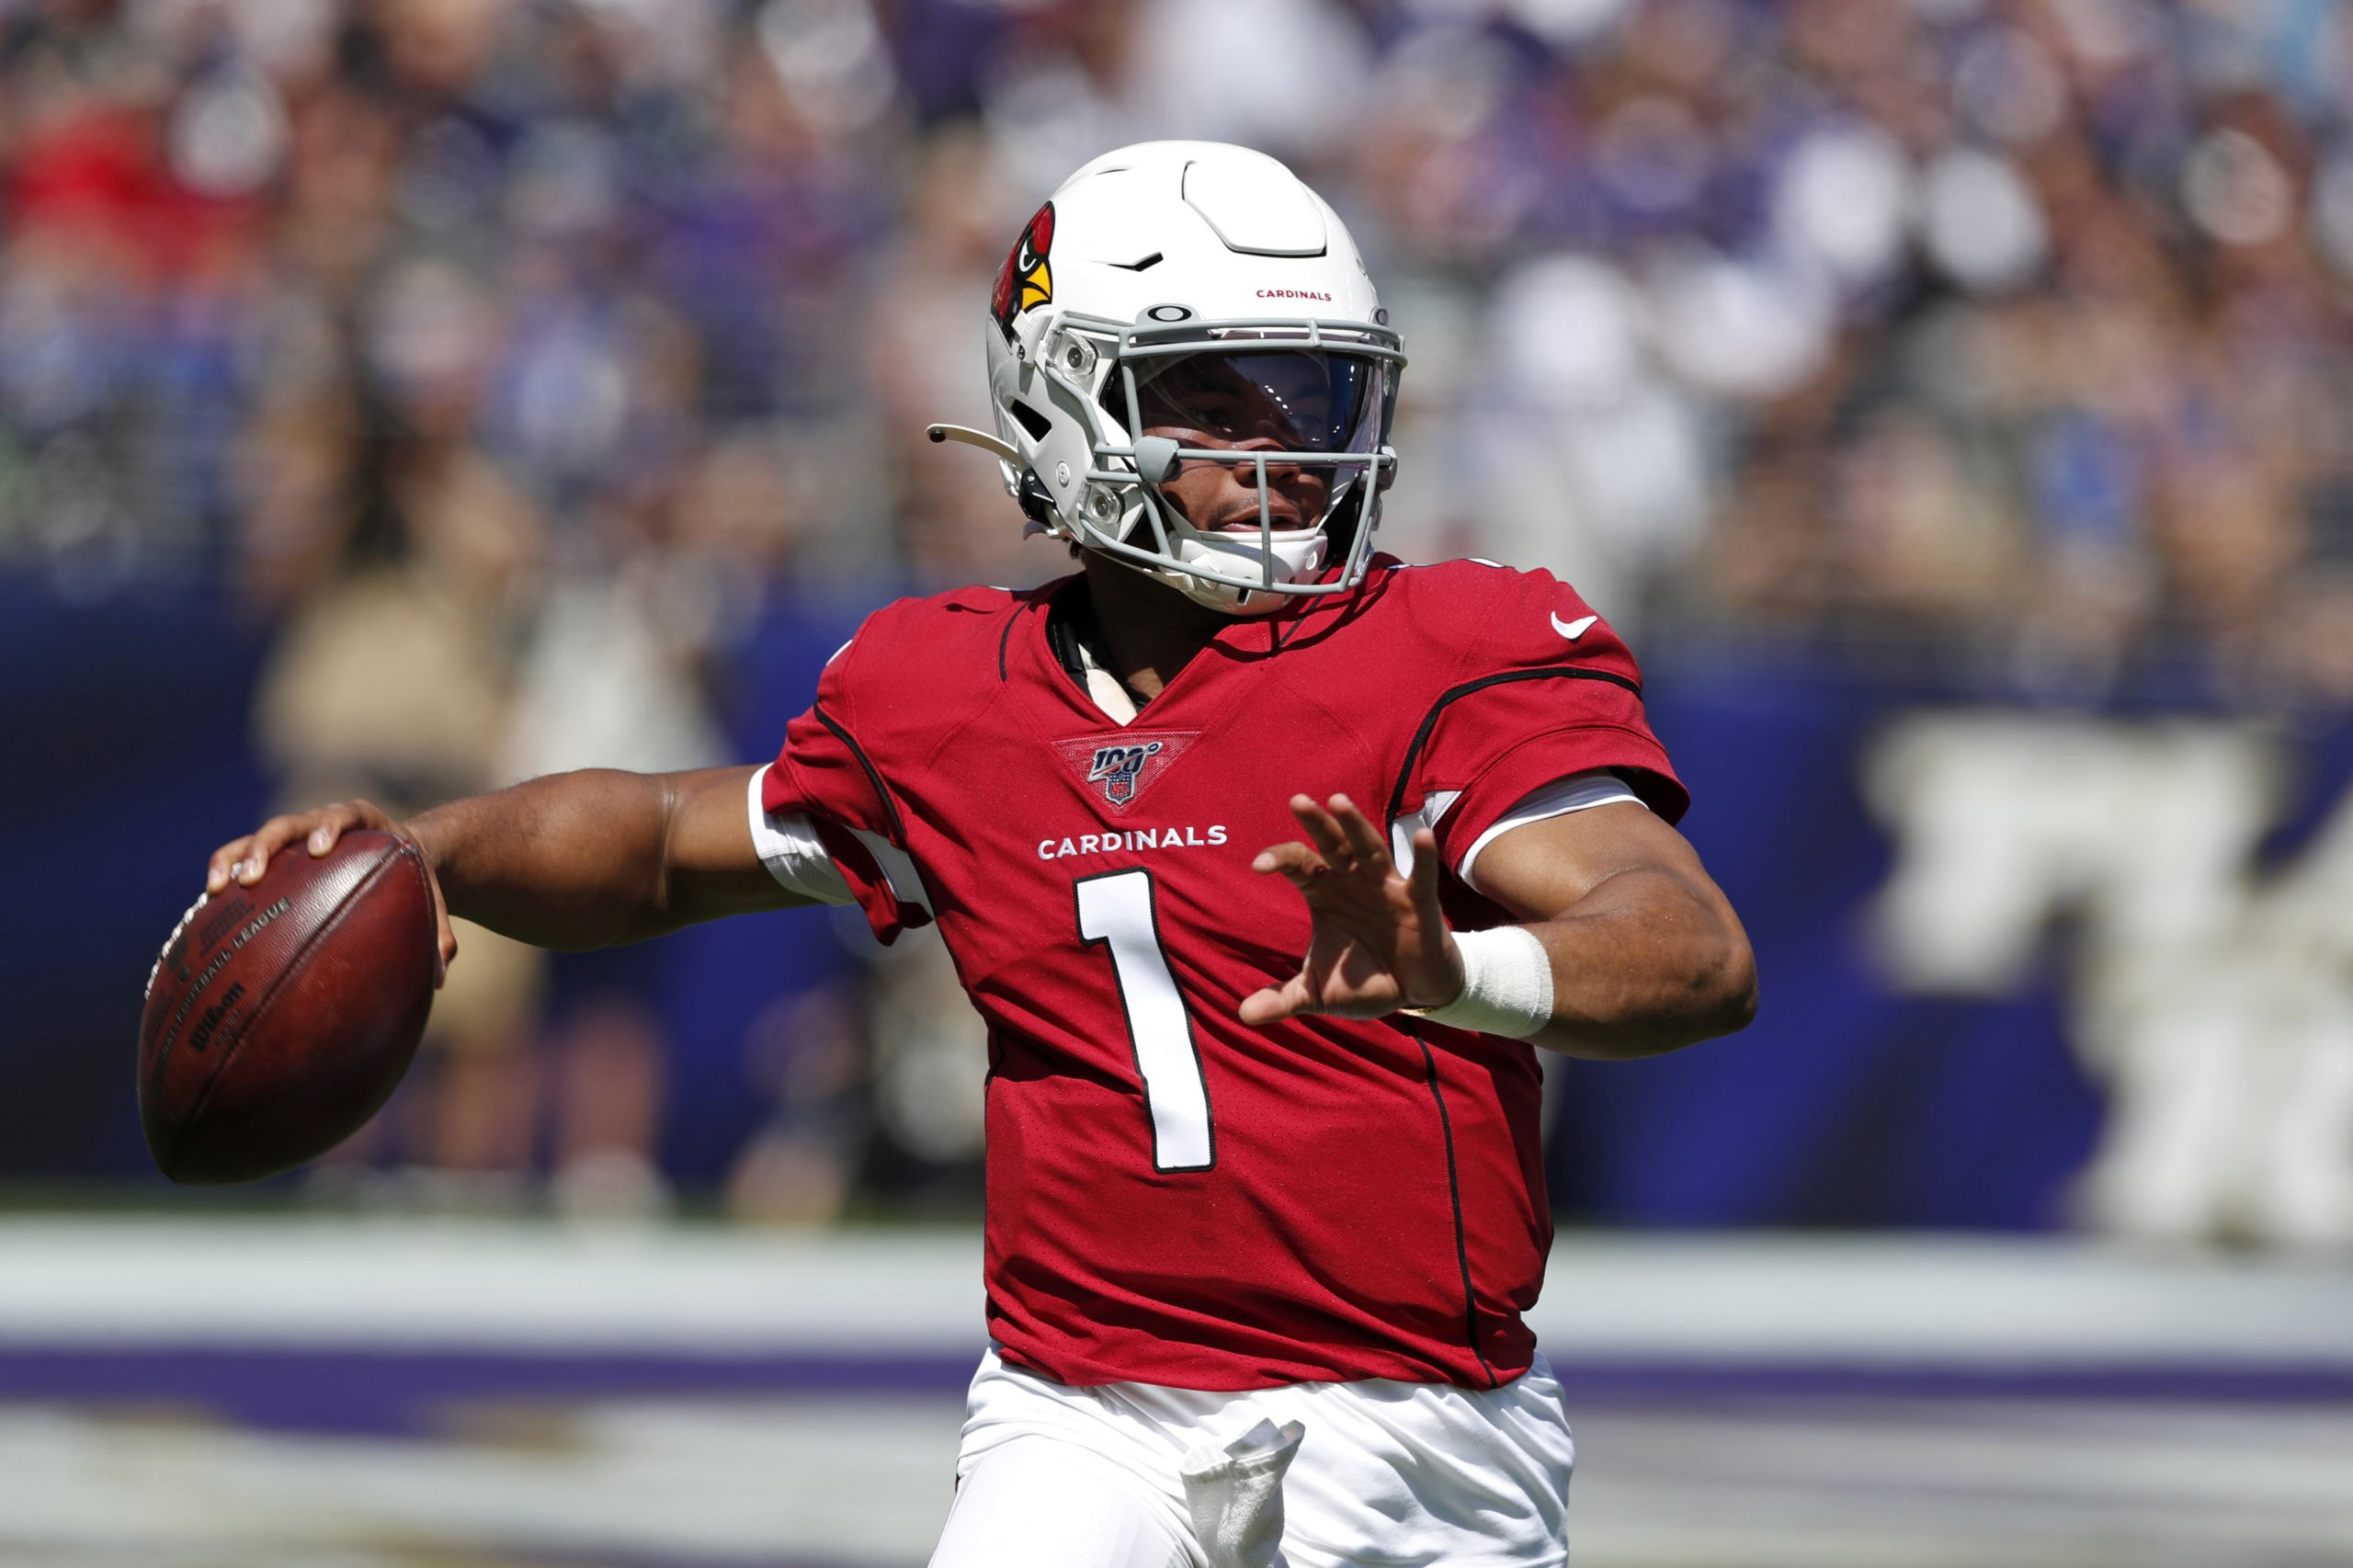 Seahawks at Cardinals Free Pick